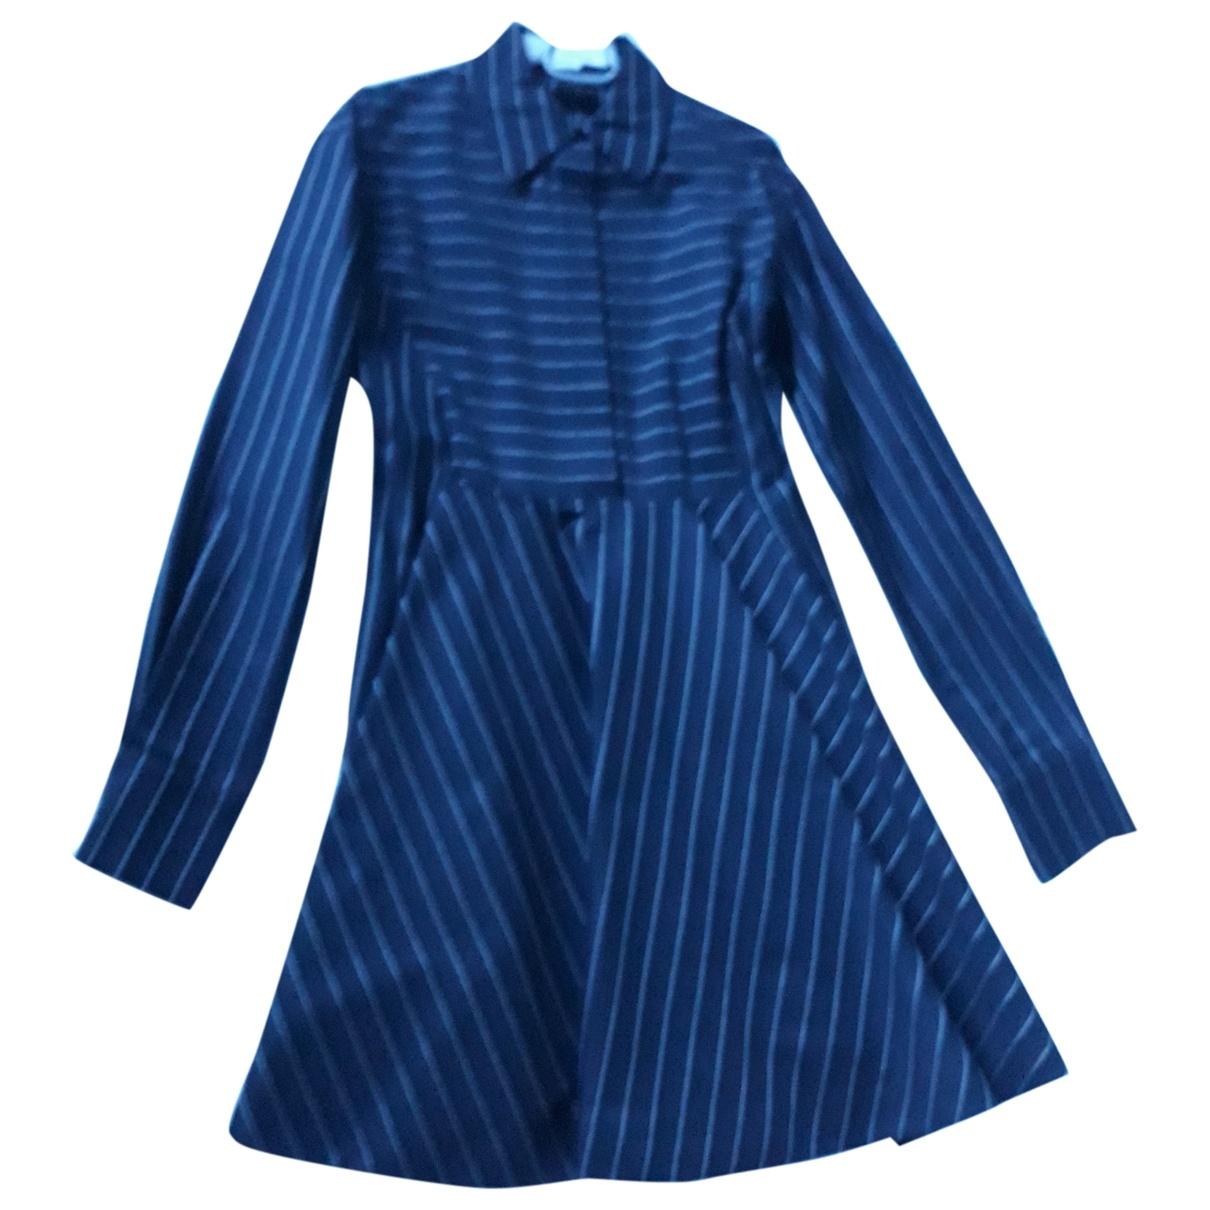 Stella Mccartney \N Wool dress for Women 34 FR